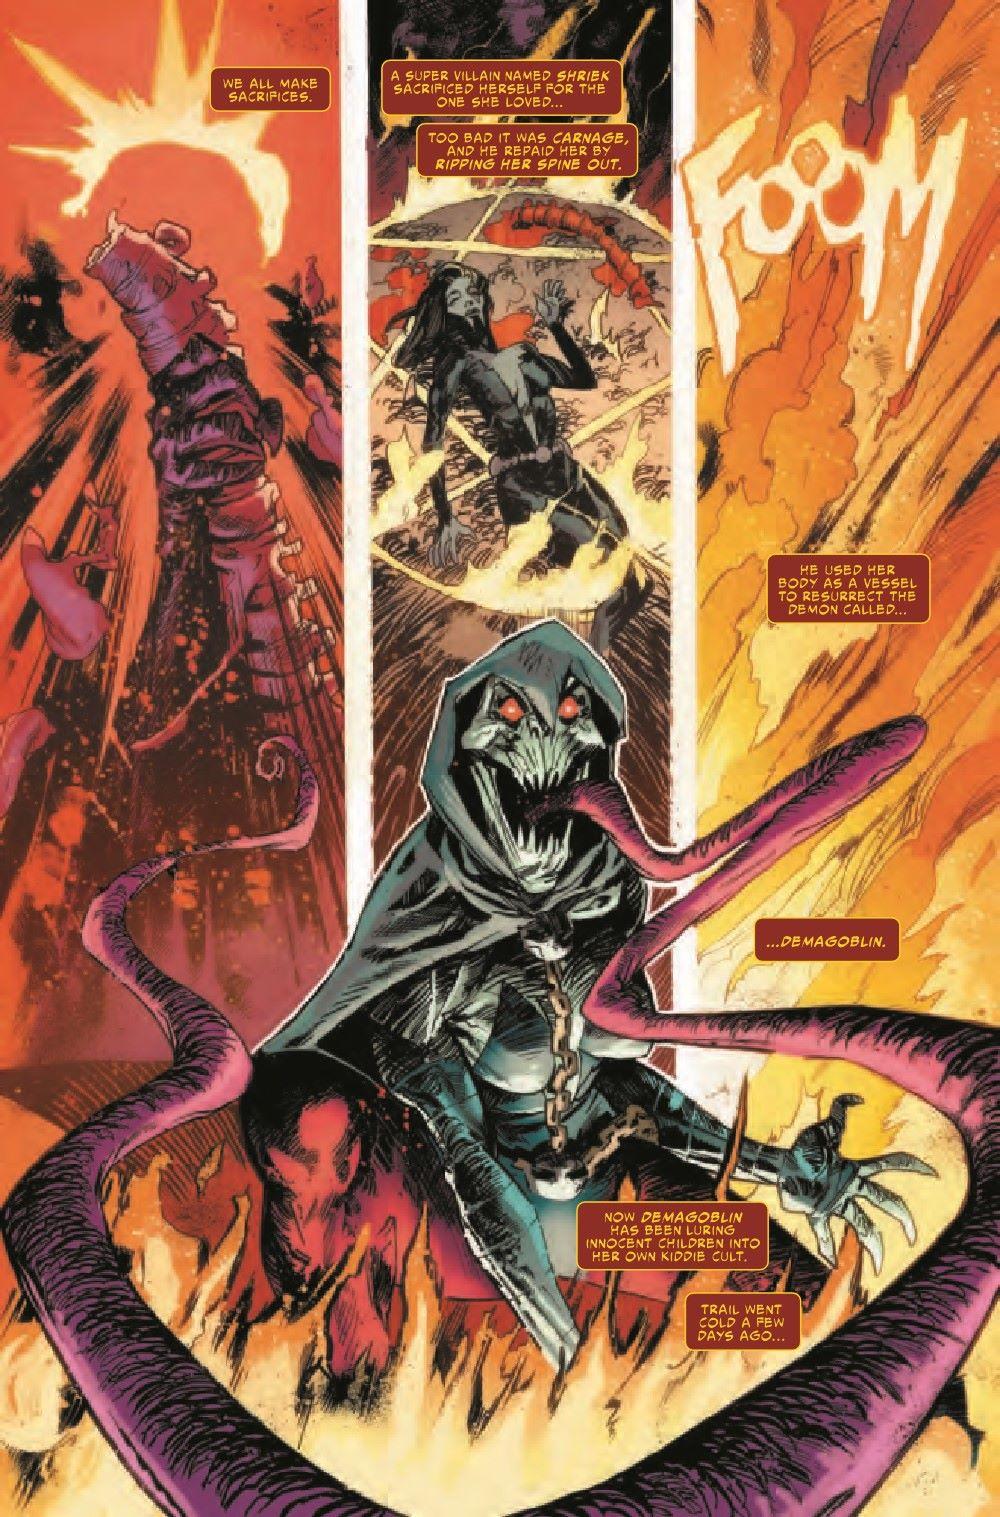 SCREAMKIB2021001_Preview-3 ComicList Previews: KING IN BLACK SCREAM #1